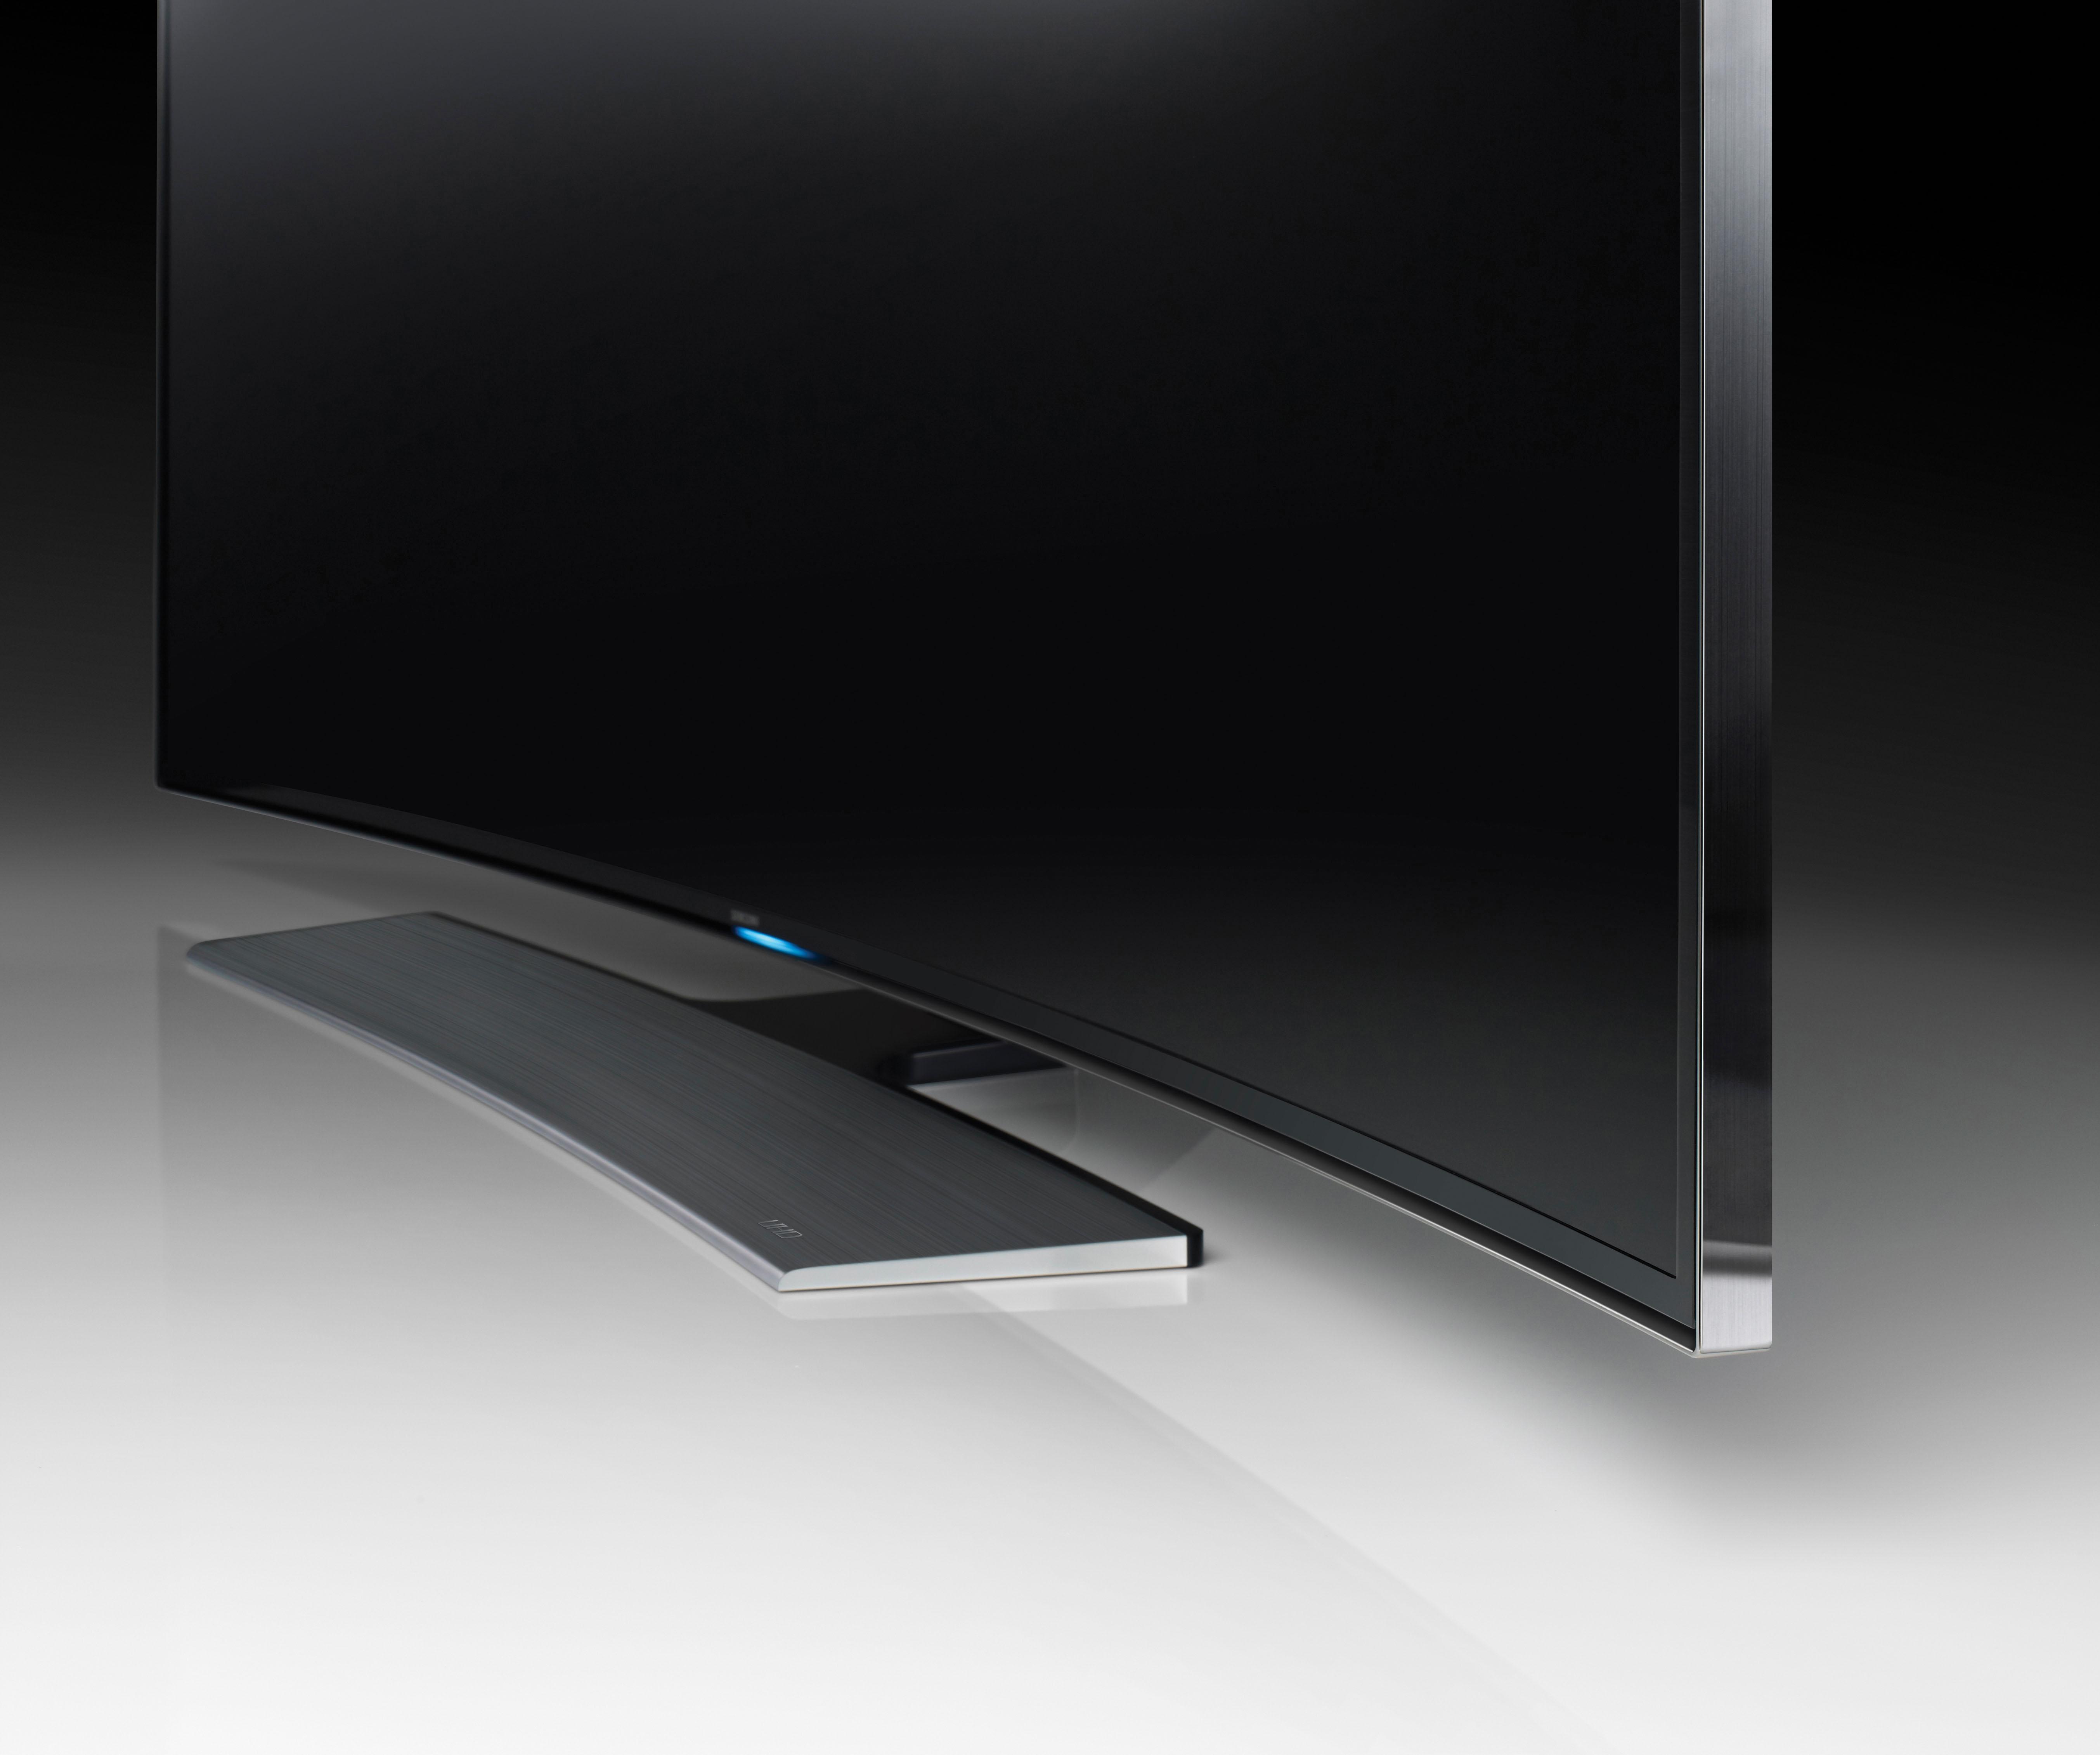 samsung announces u9000 and u8550 uhd televisions at ces 2014 sammobile. Black Bedroom Furniture Sets. Home Design Ideas